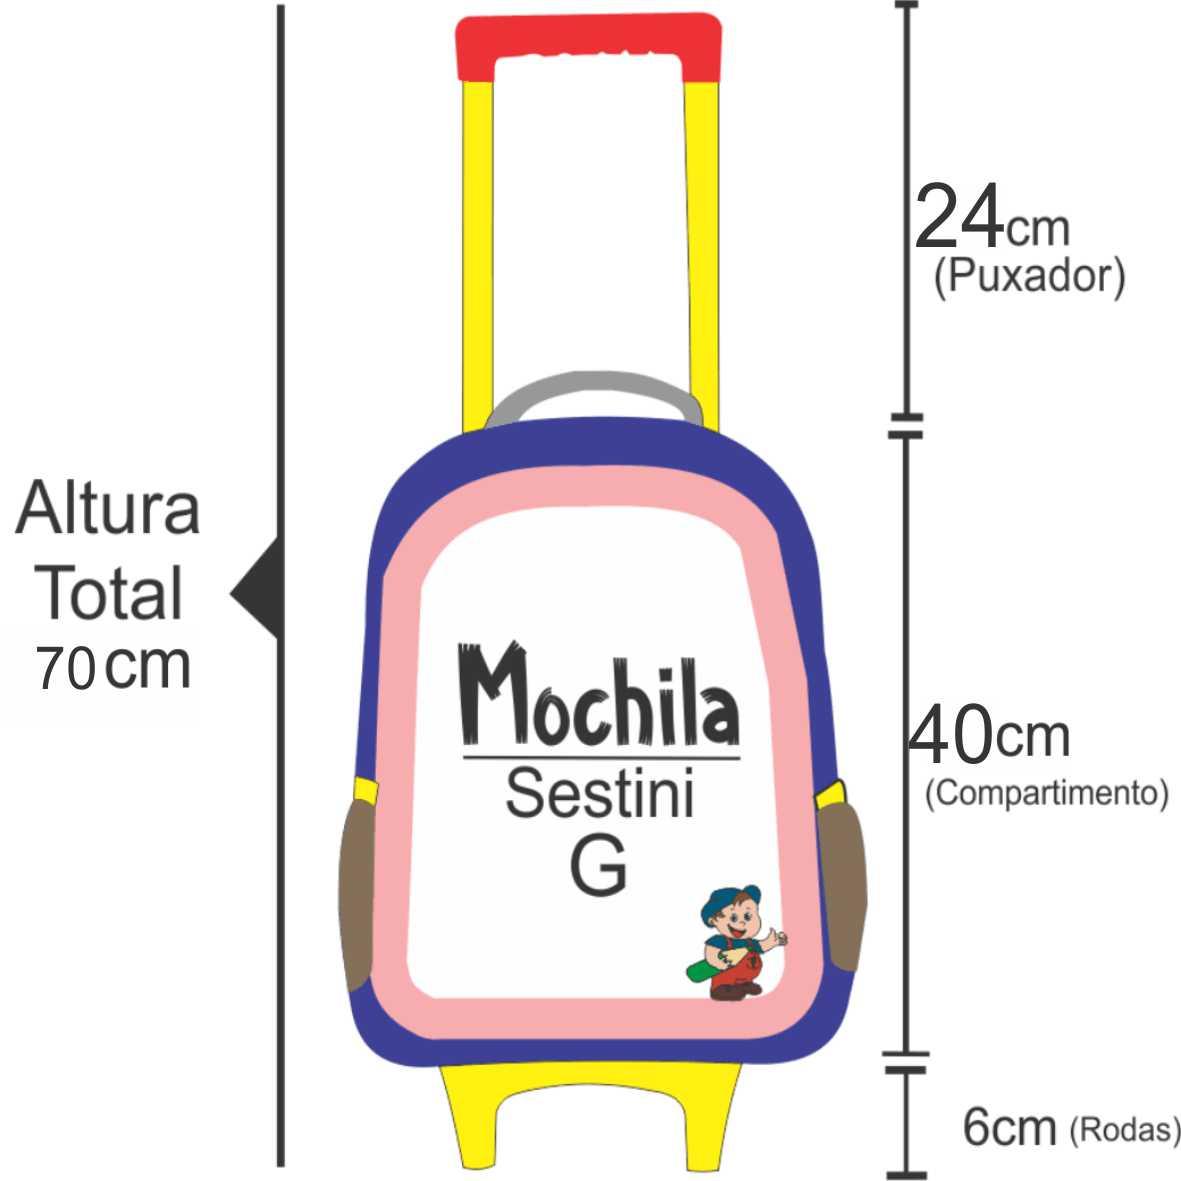 medidas da altura da mochila da minnie